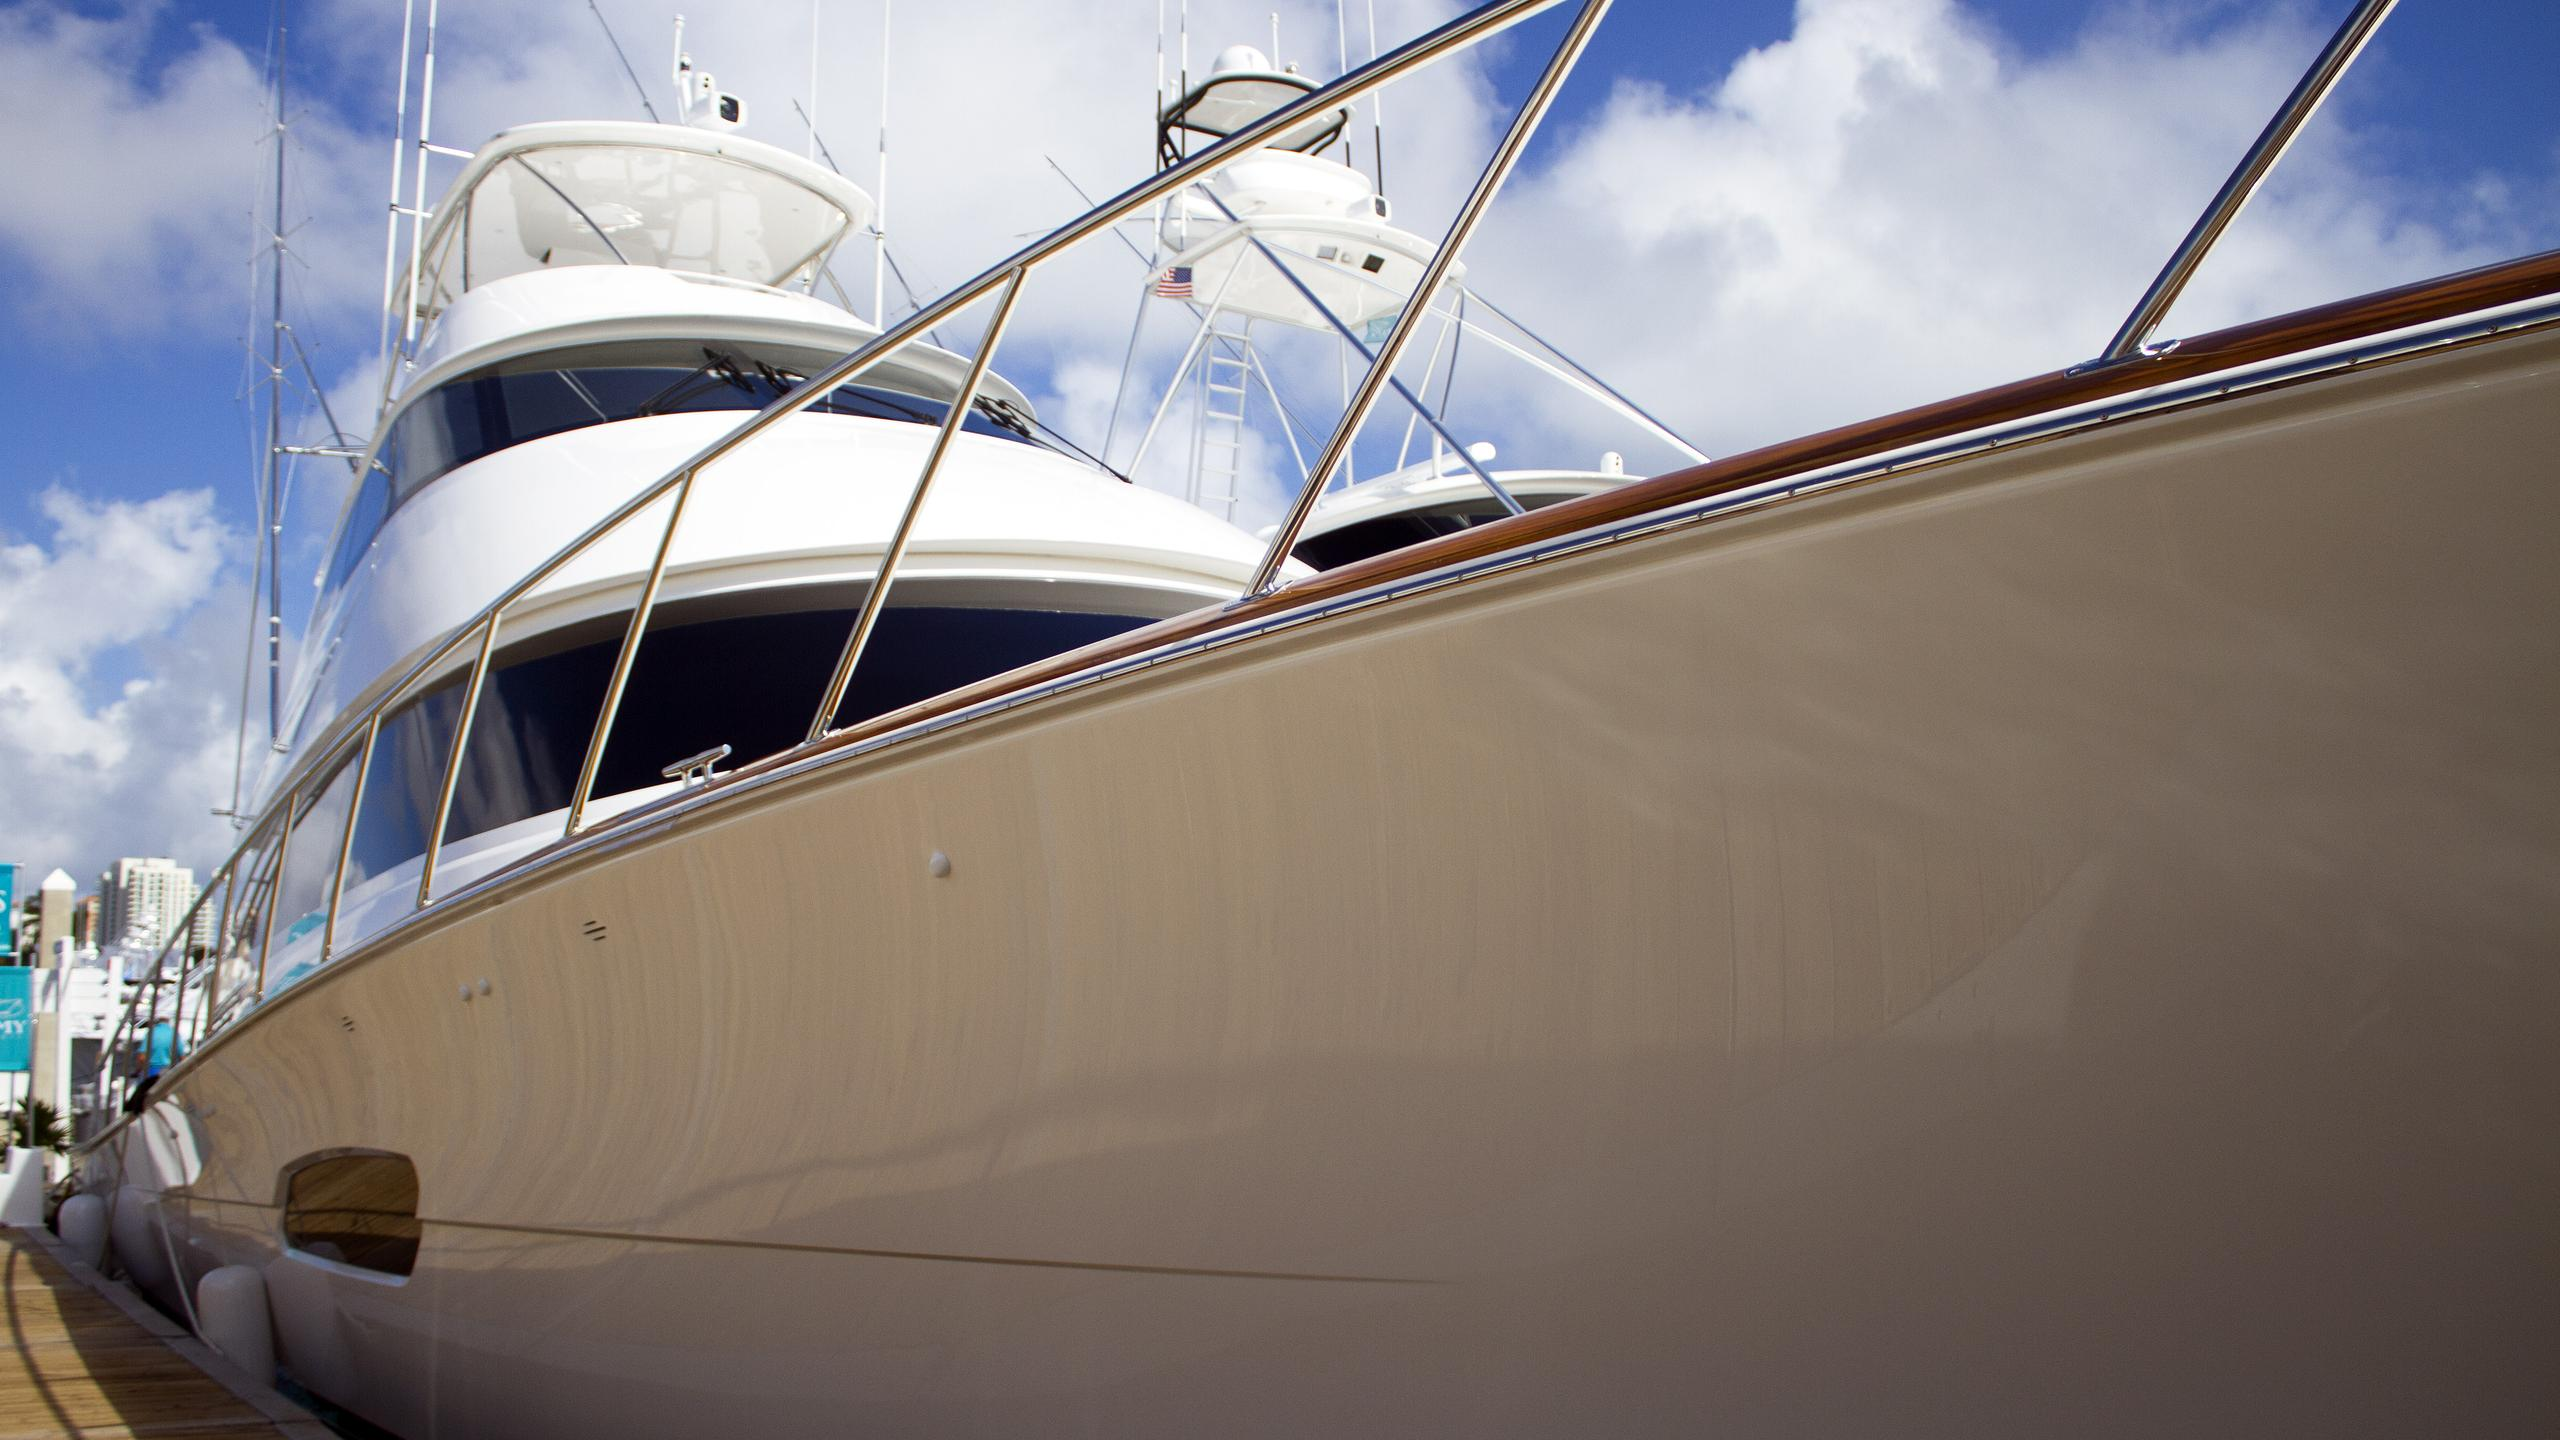 a-work-of-art-sportfish-motoryacht-viking-92-2016-28m-bow